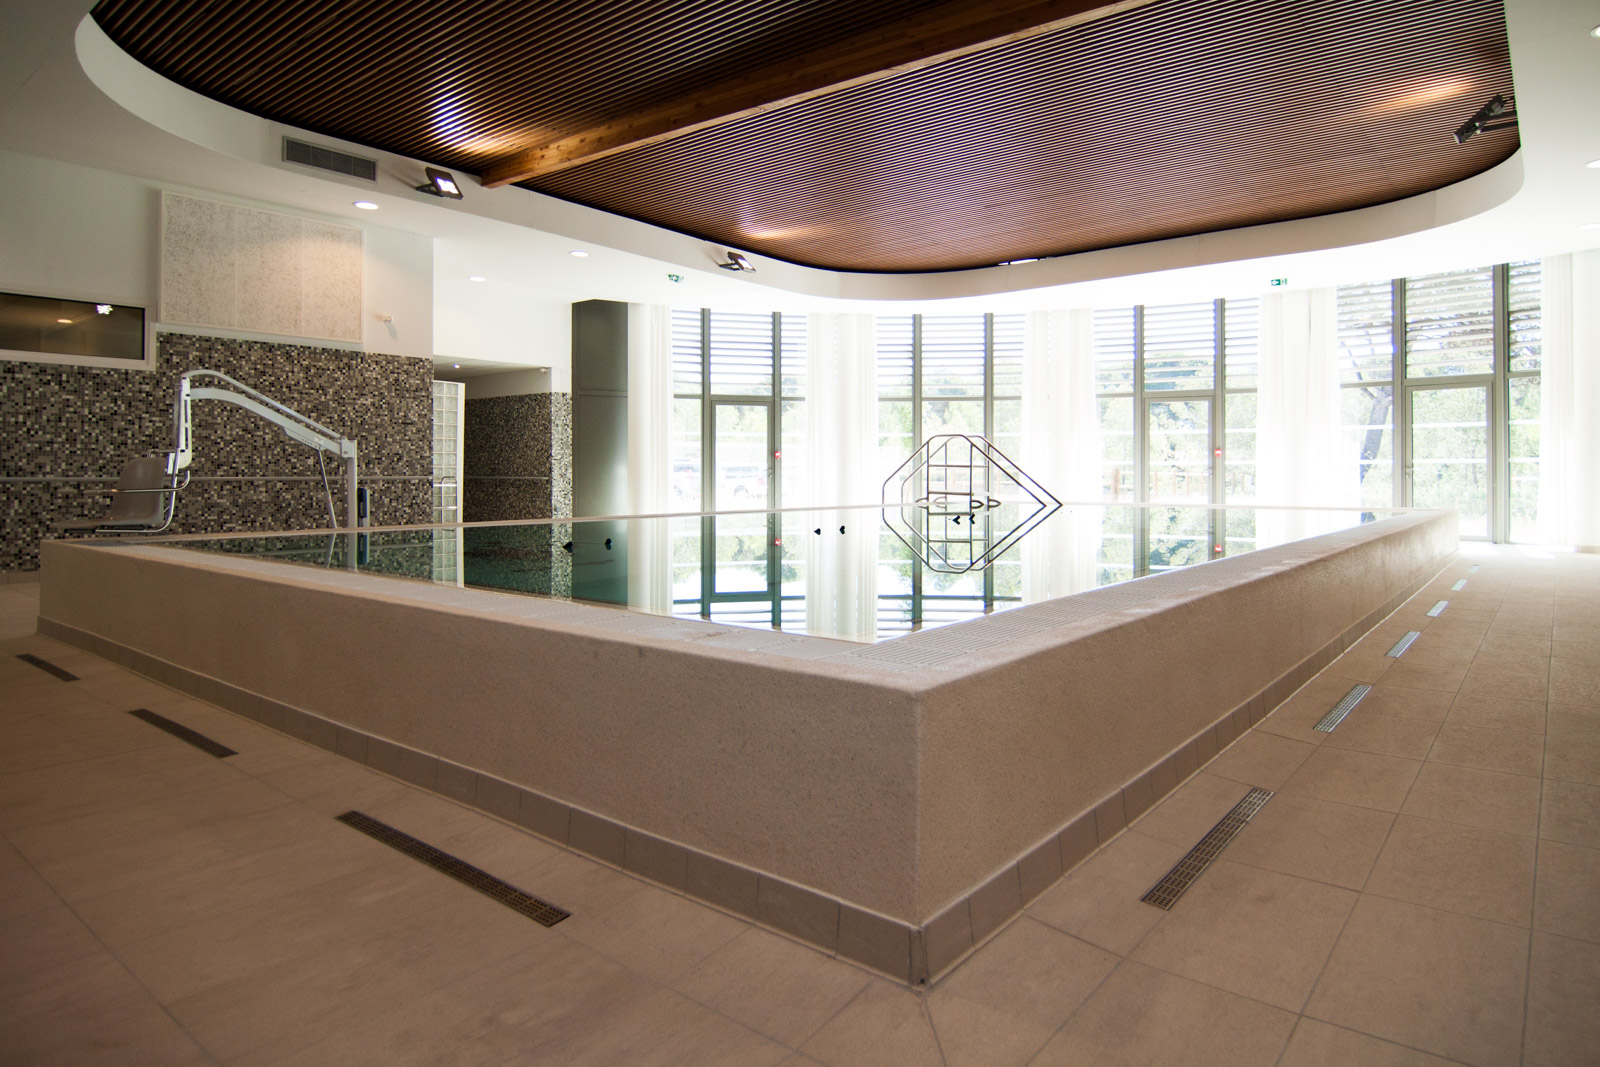 installation de piscine cot bleu. Black Bedroom Furniture Sets. Home Design Ideas